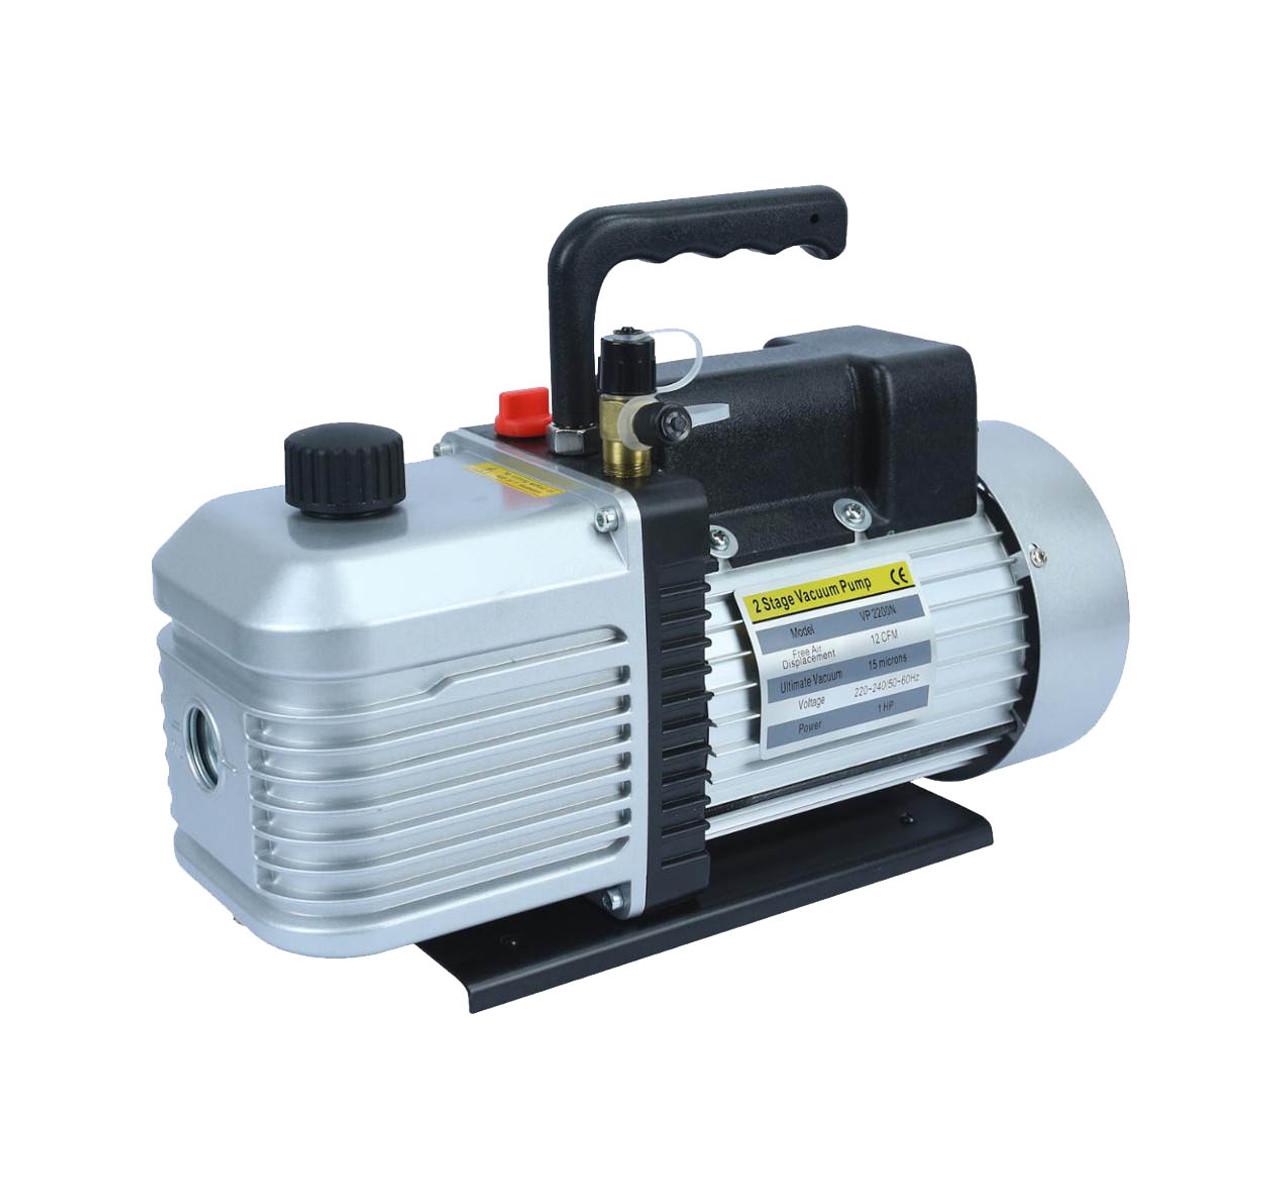 Vacuum Pump - Industrial/Commercial Use 230L/m